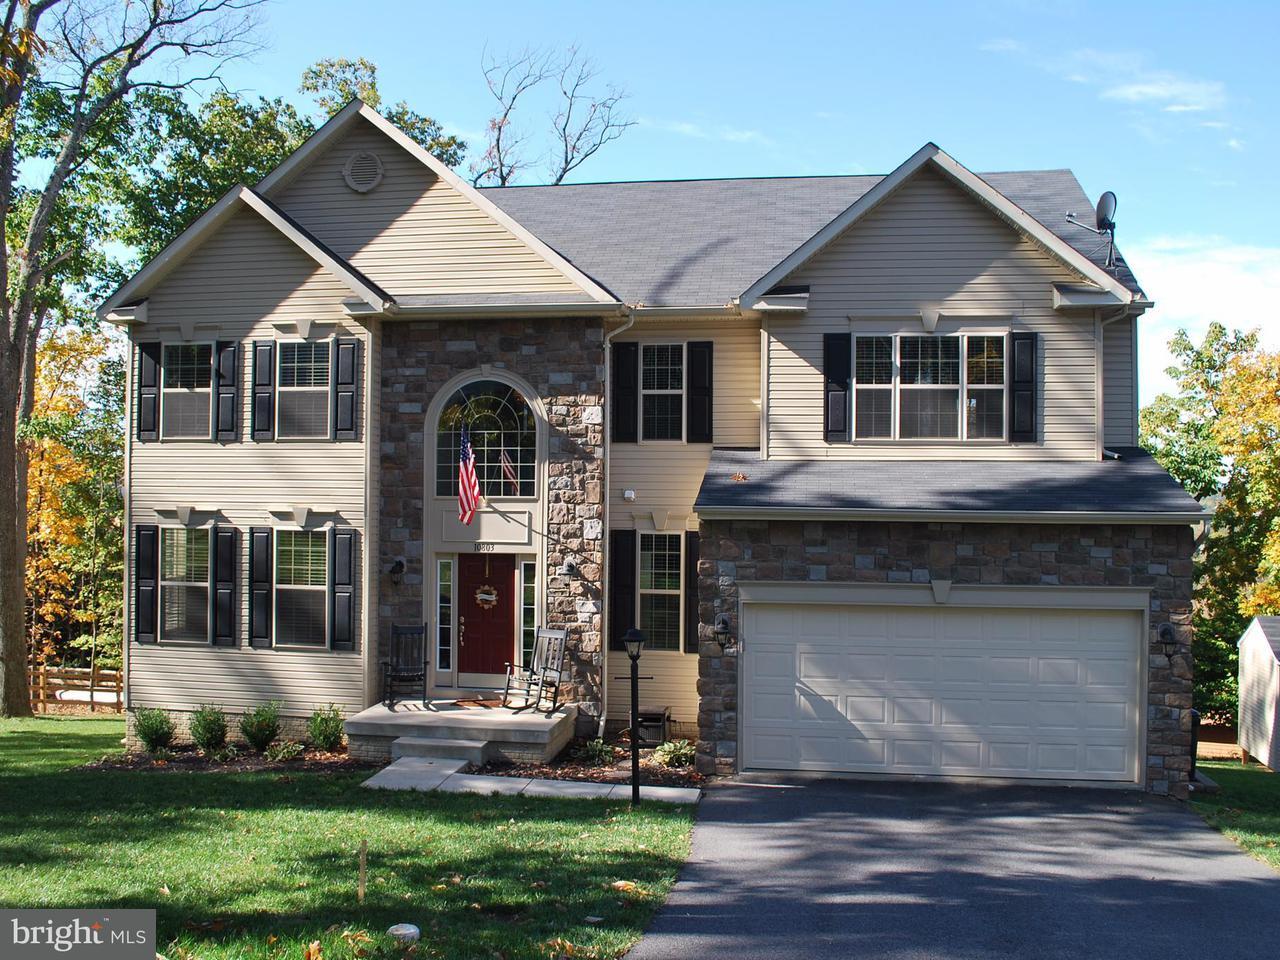 Casa Unifamiliar por un Venta en 10803 RIDGEWOOD Court 10803 RIDGEWOOD Court New Market, Maryland 21774 Estados Unidos